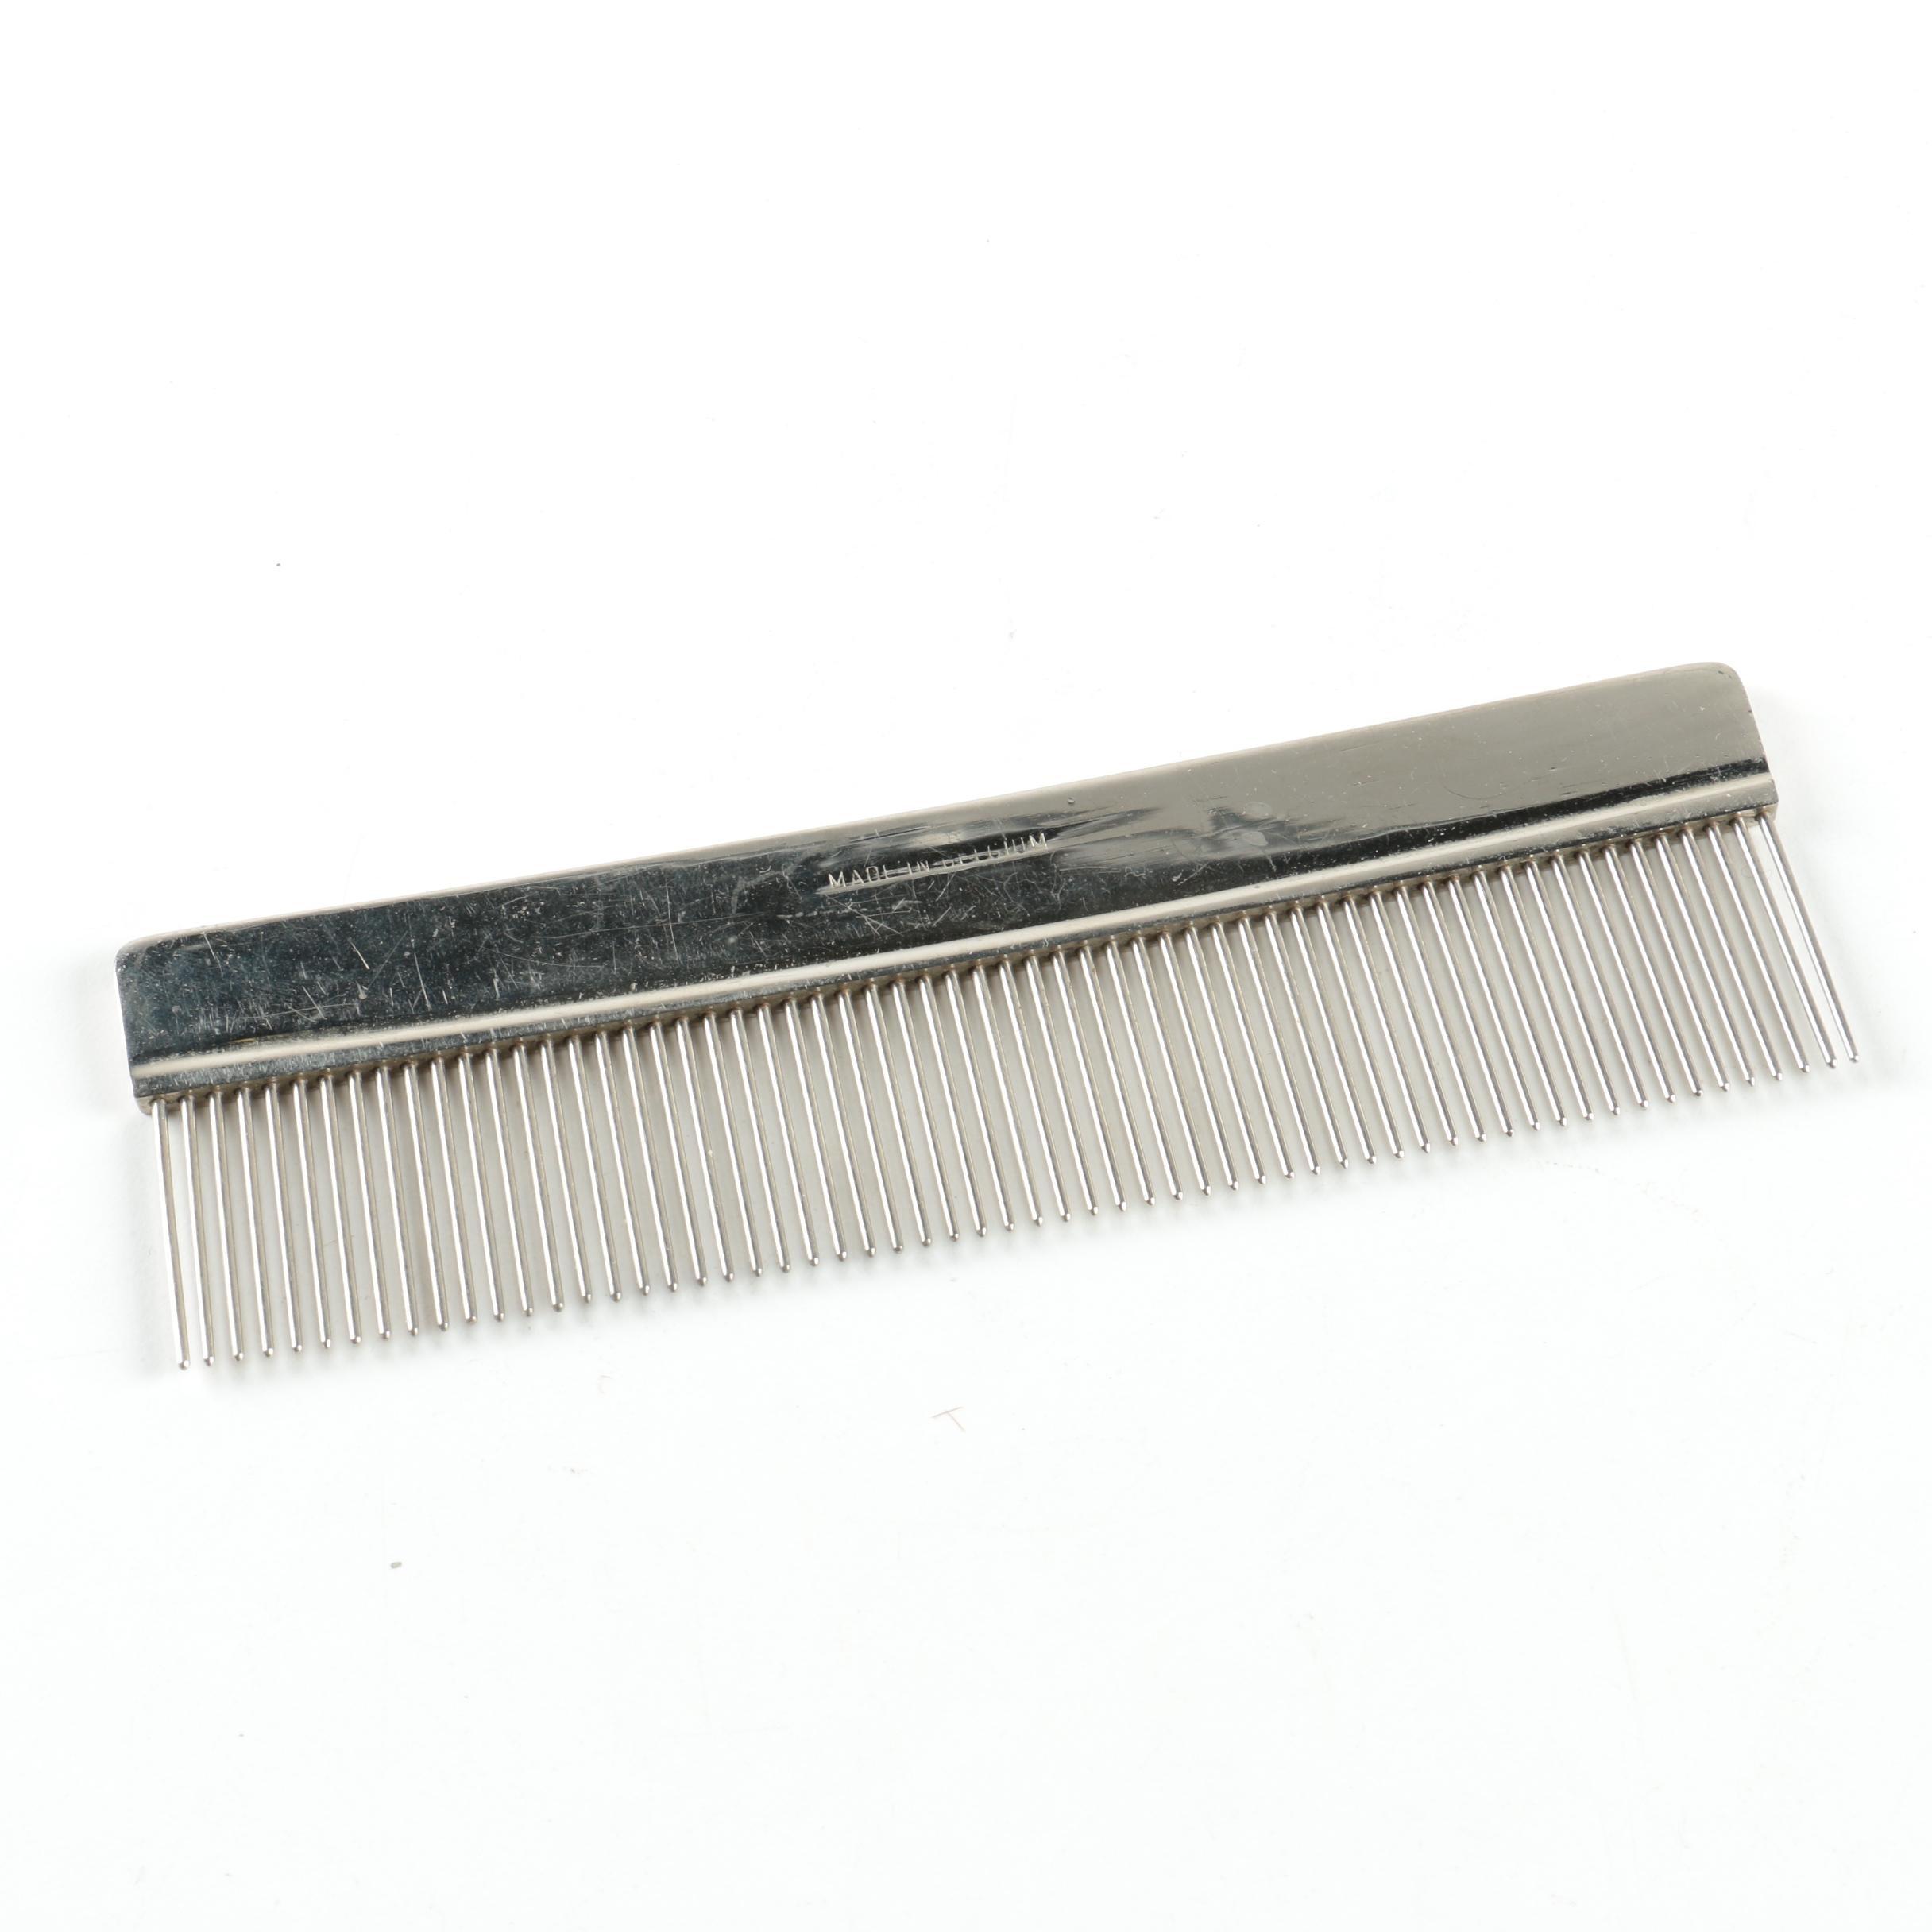 Belgium Made Metal Grooming Comb